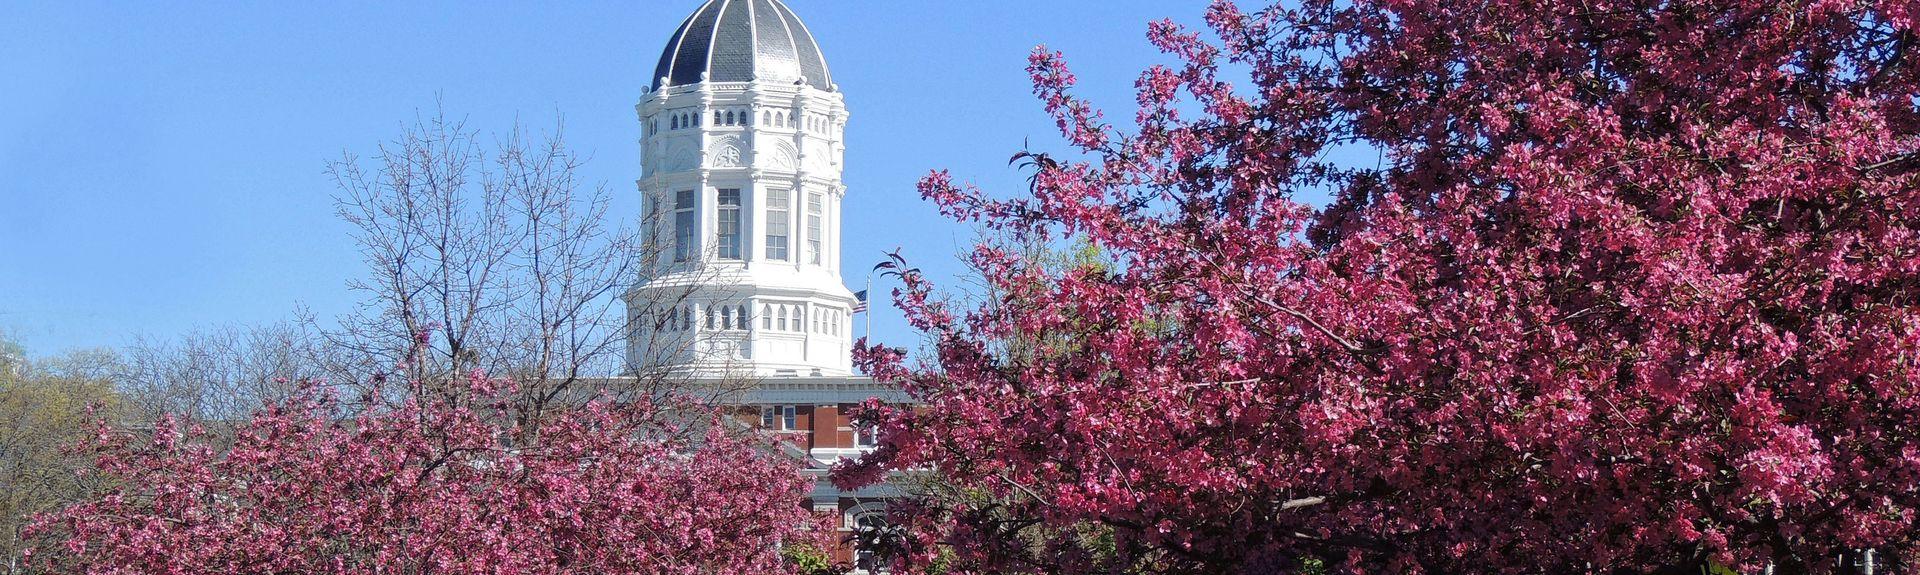 Columbia, Missouri, United States of America